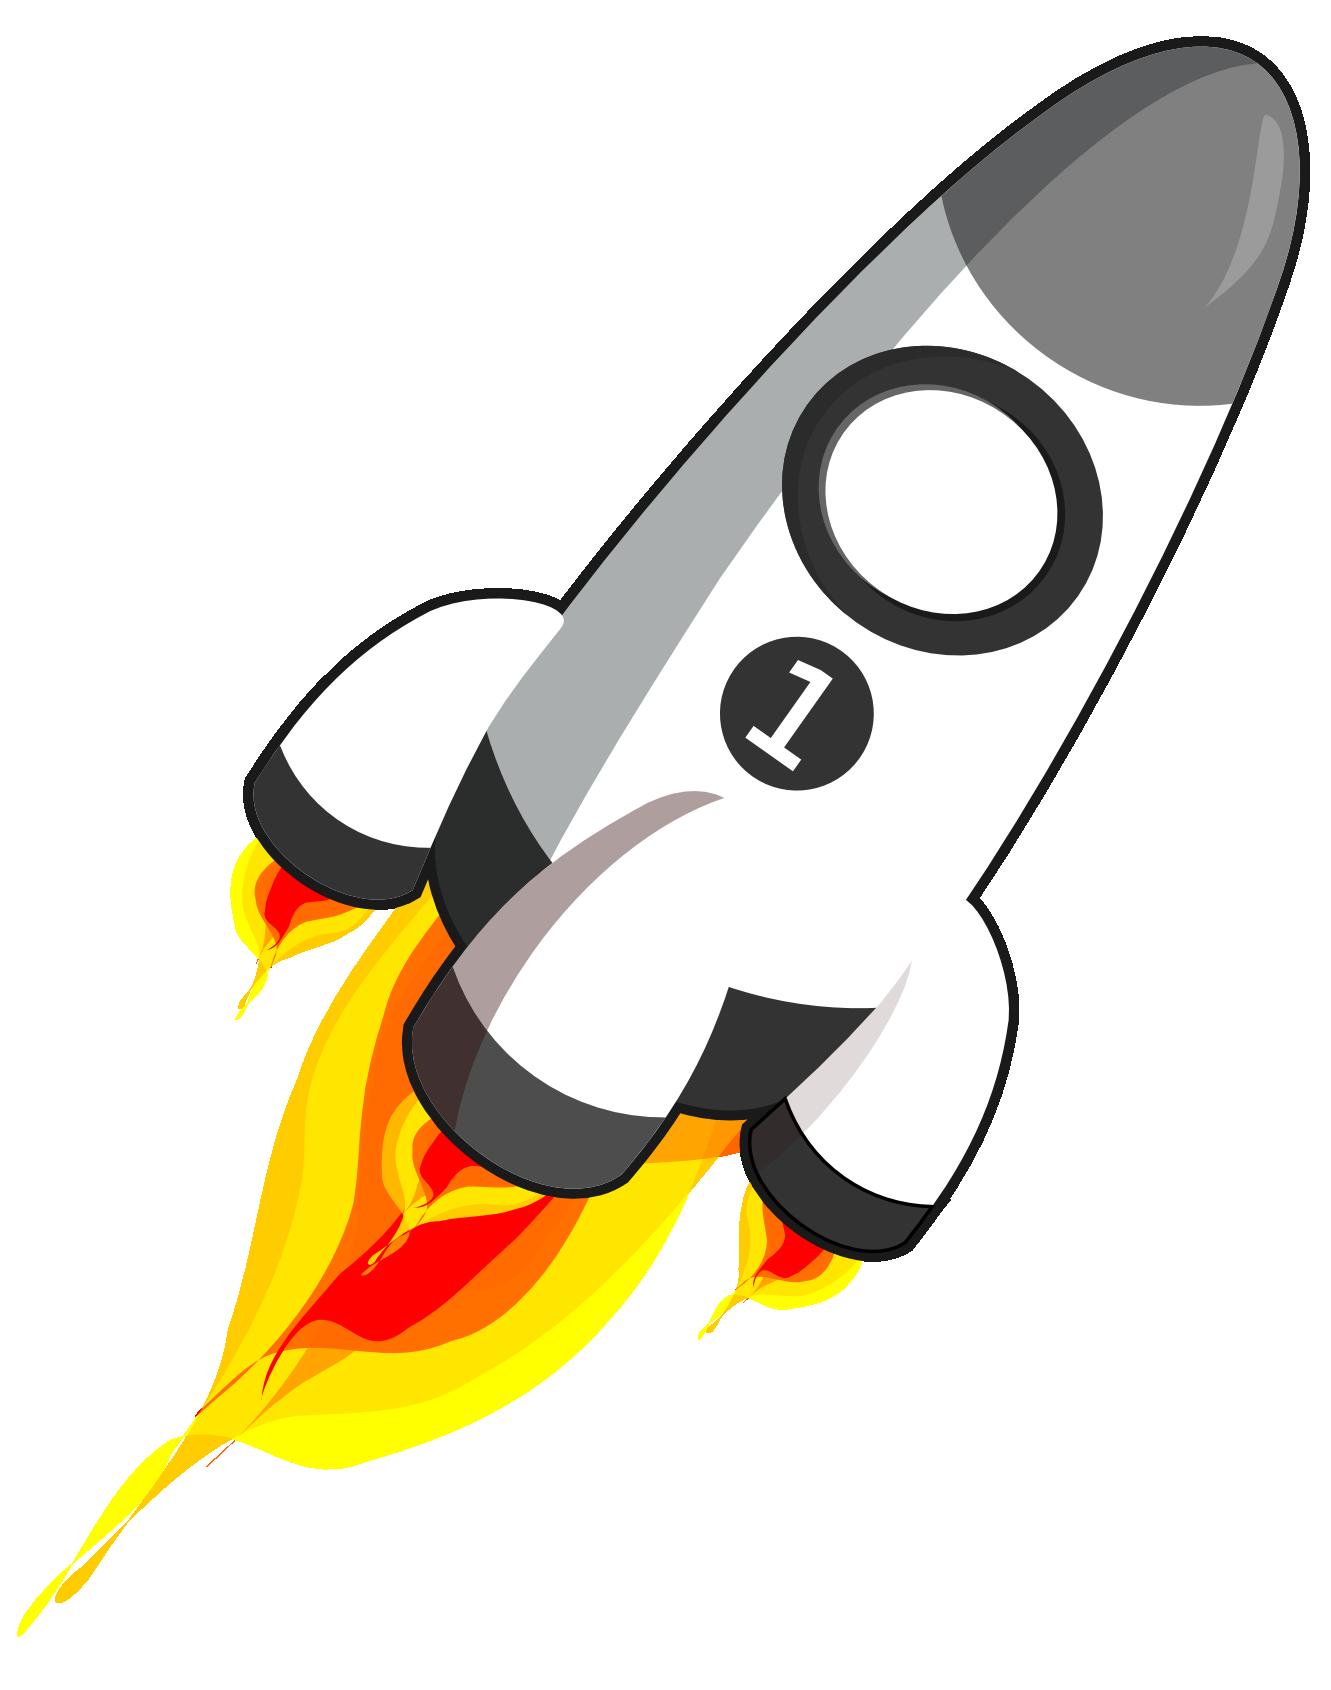 Cartoon Image Of Rocket